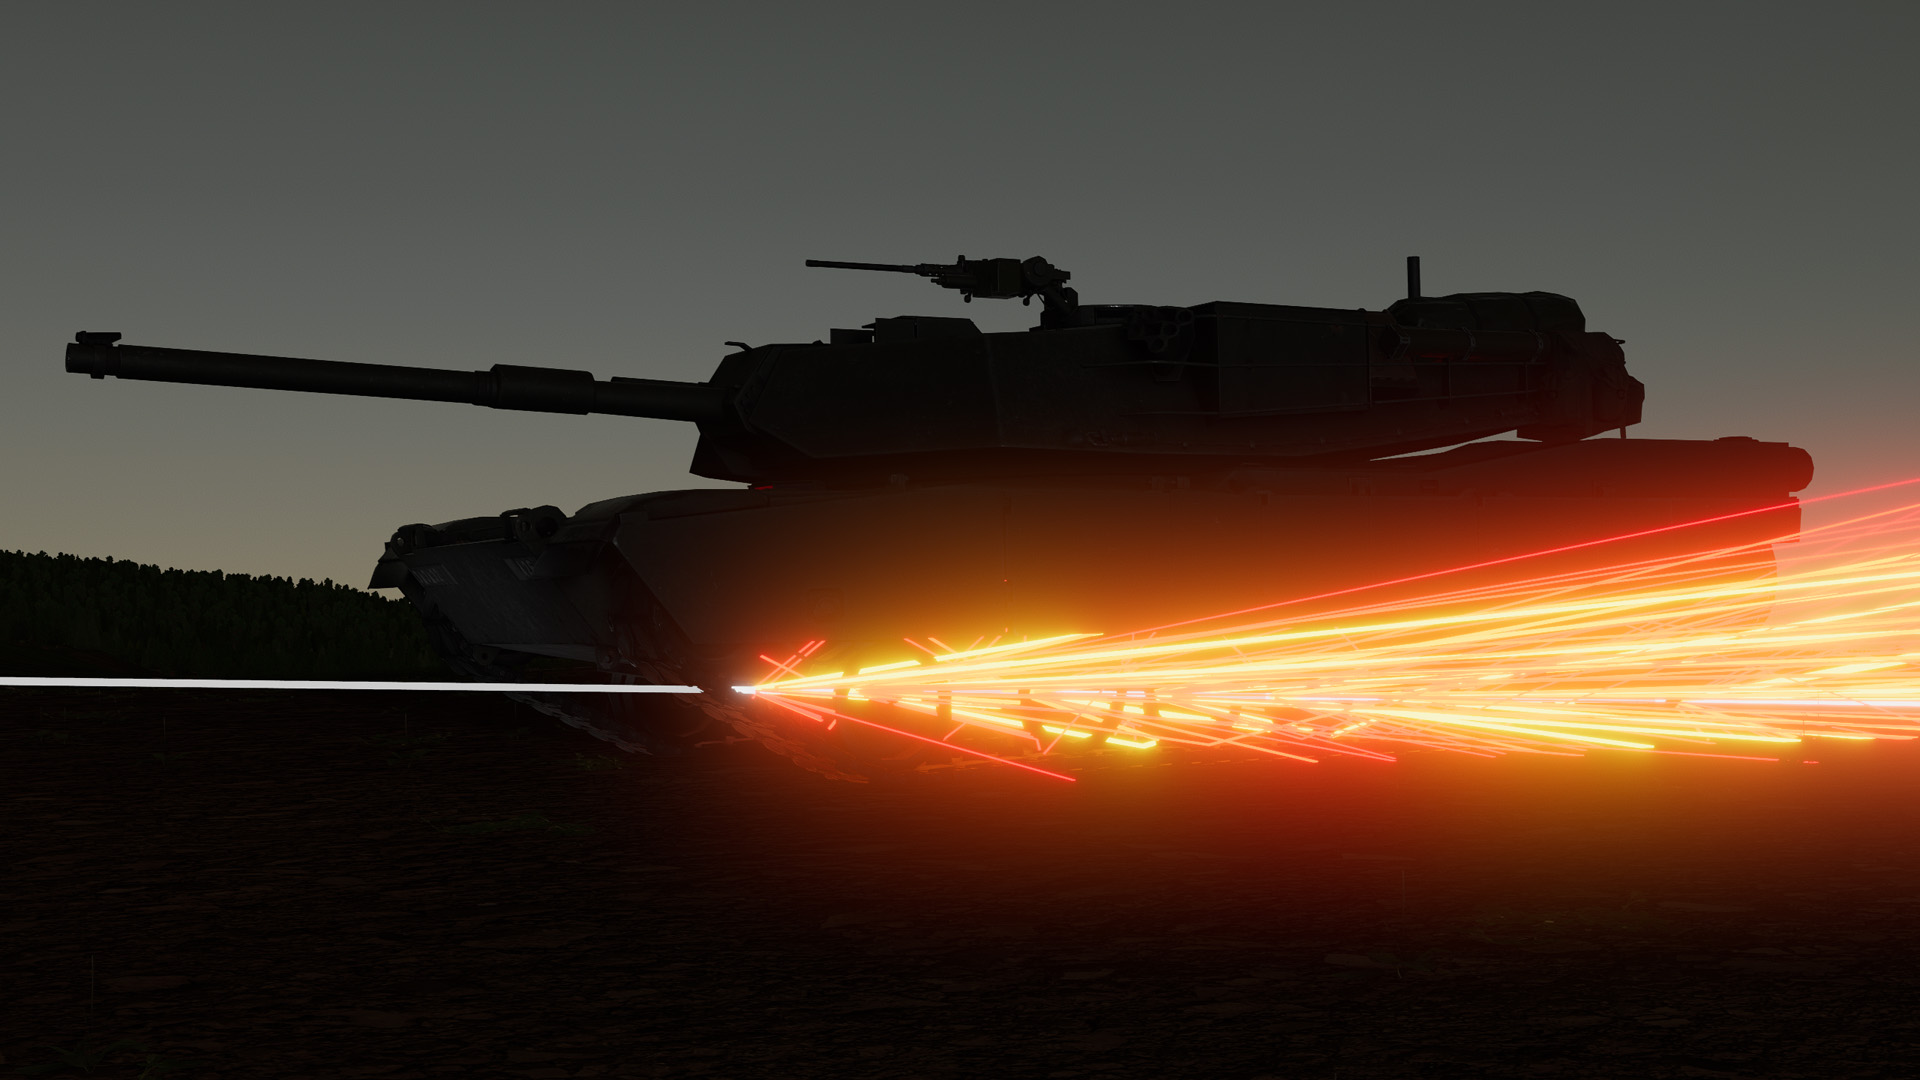 M1IP hit spalling in AAR mode